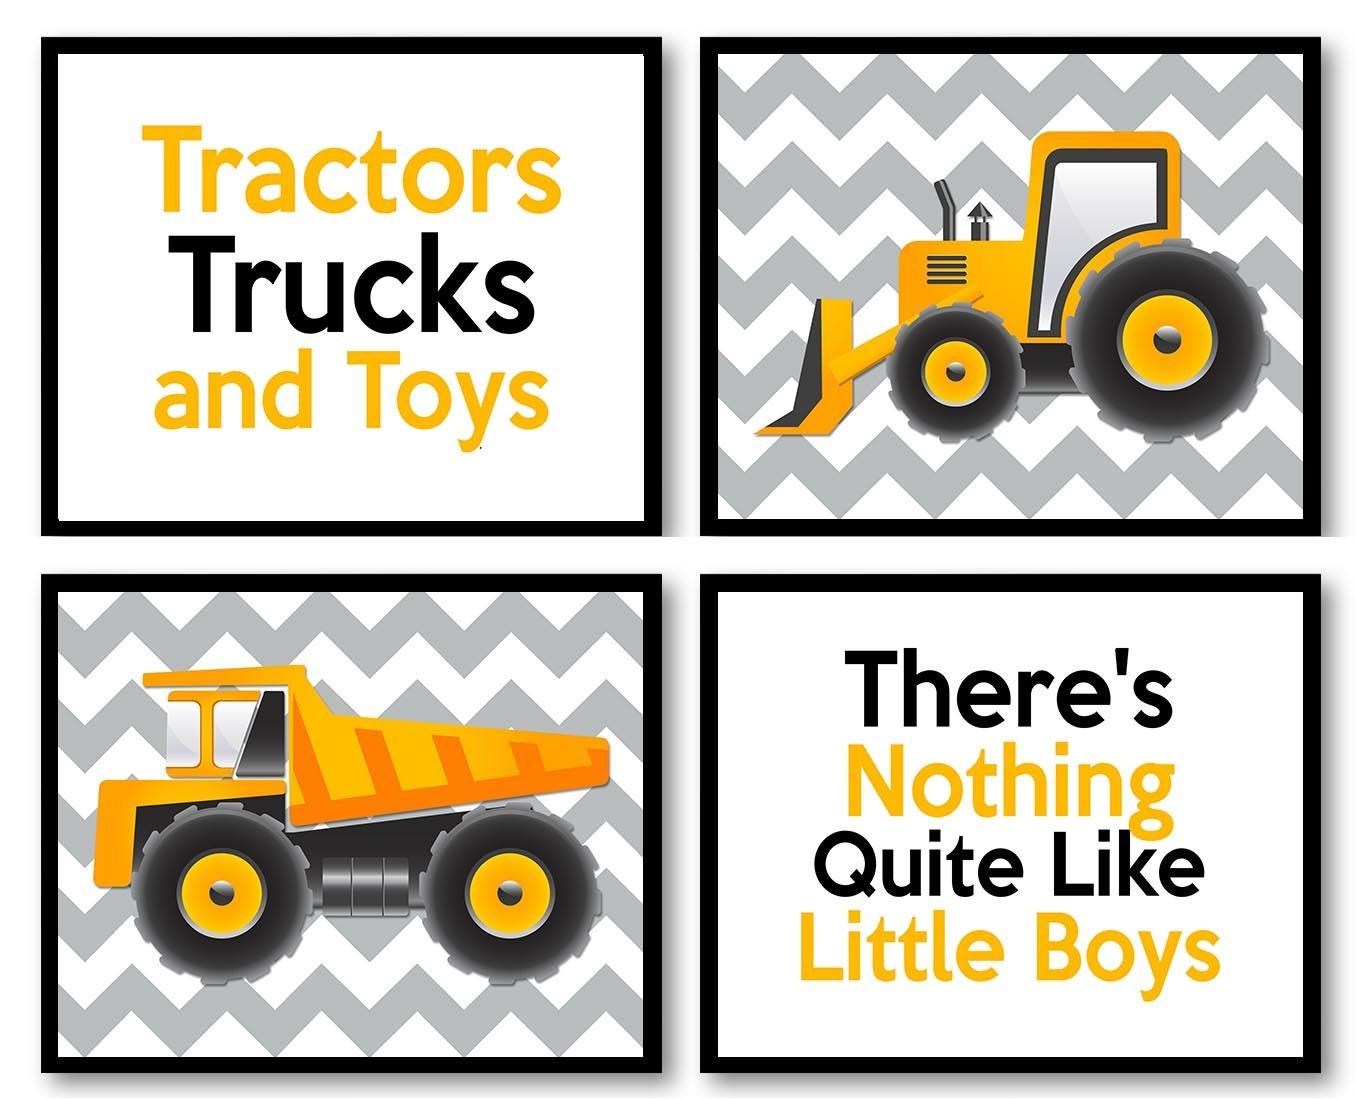 Tractor Truck Little Boys Transportation Construction Vehicles Heavy Machinery Set of 4 Prints Nurse